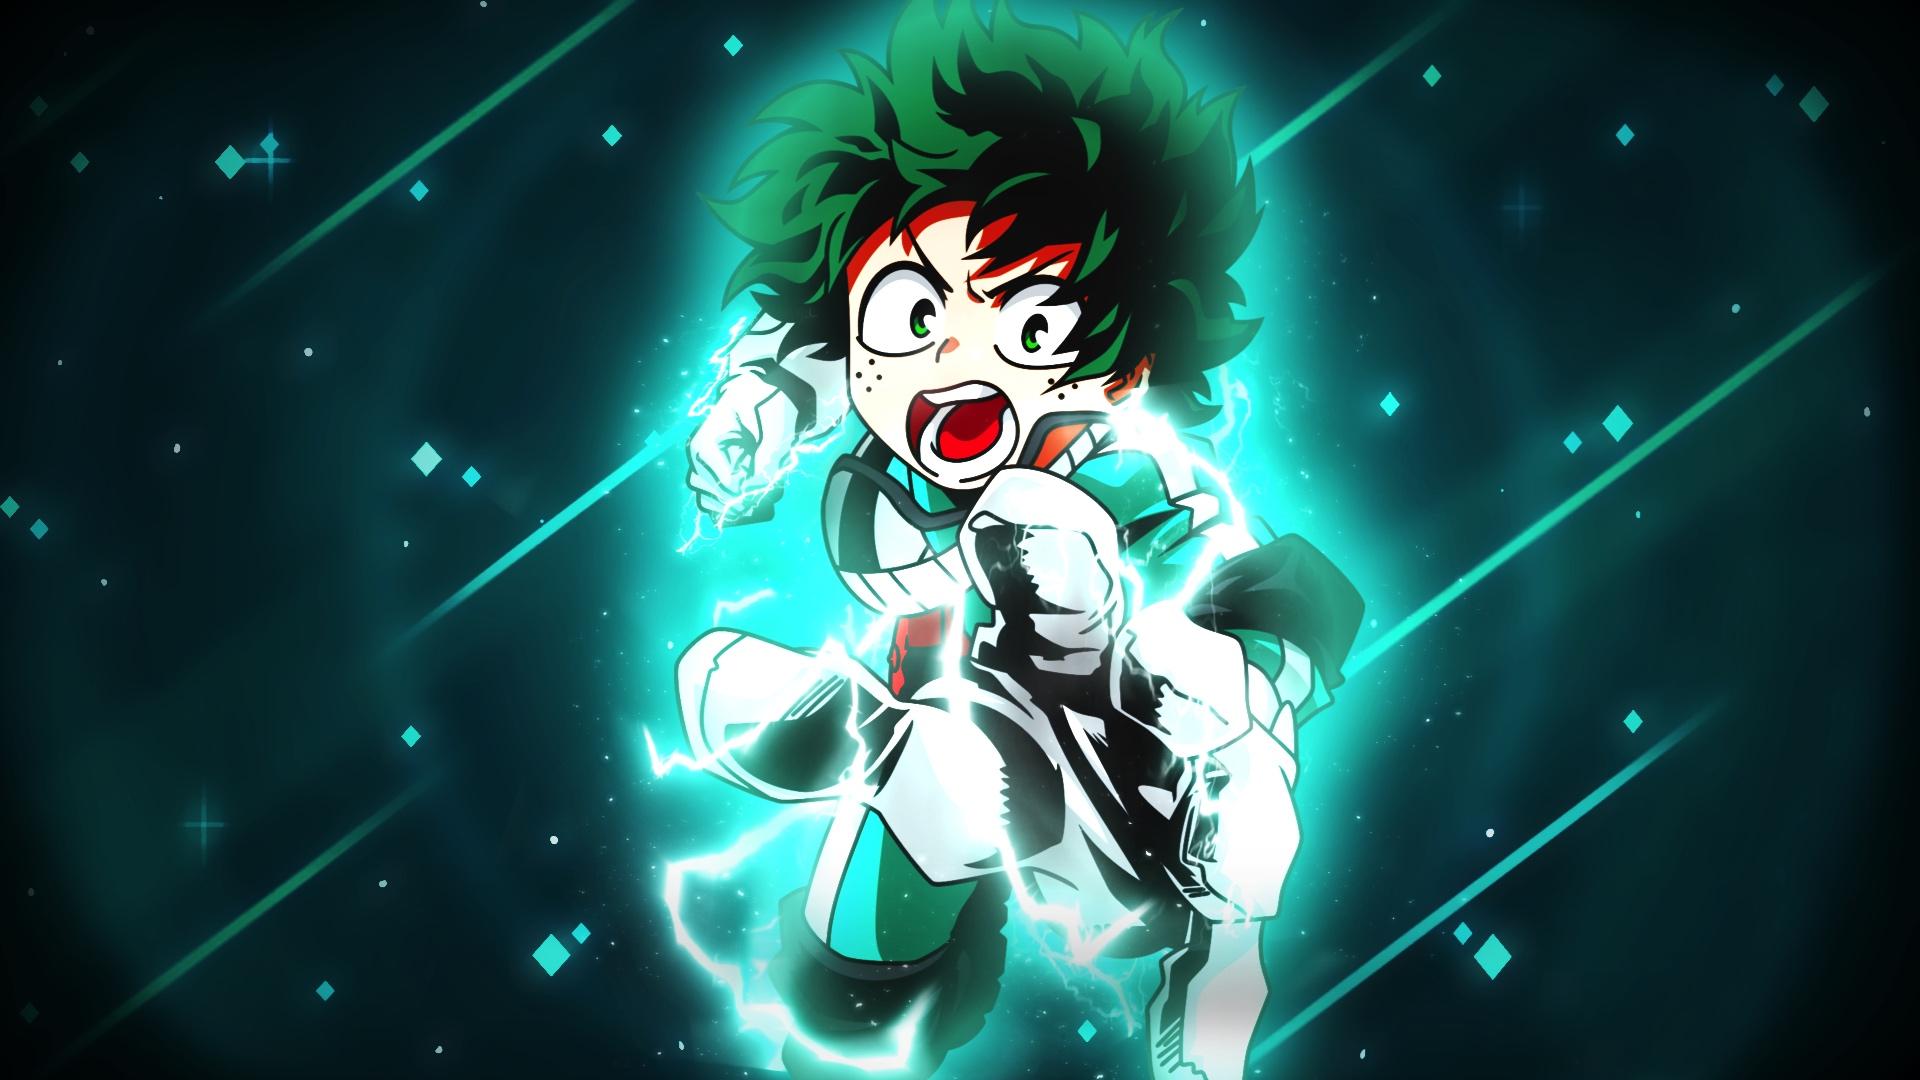 Desktop Wallpaper Izuku Midoriya Green Hair Angry Anime Boy Hd Image Picture Background 4a6435